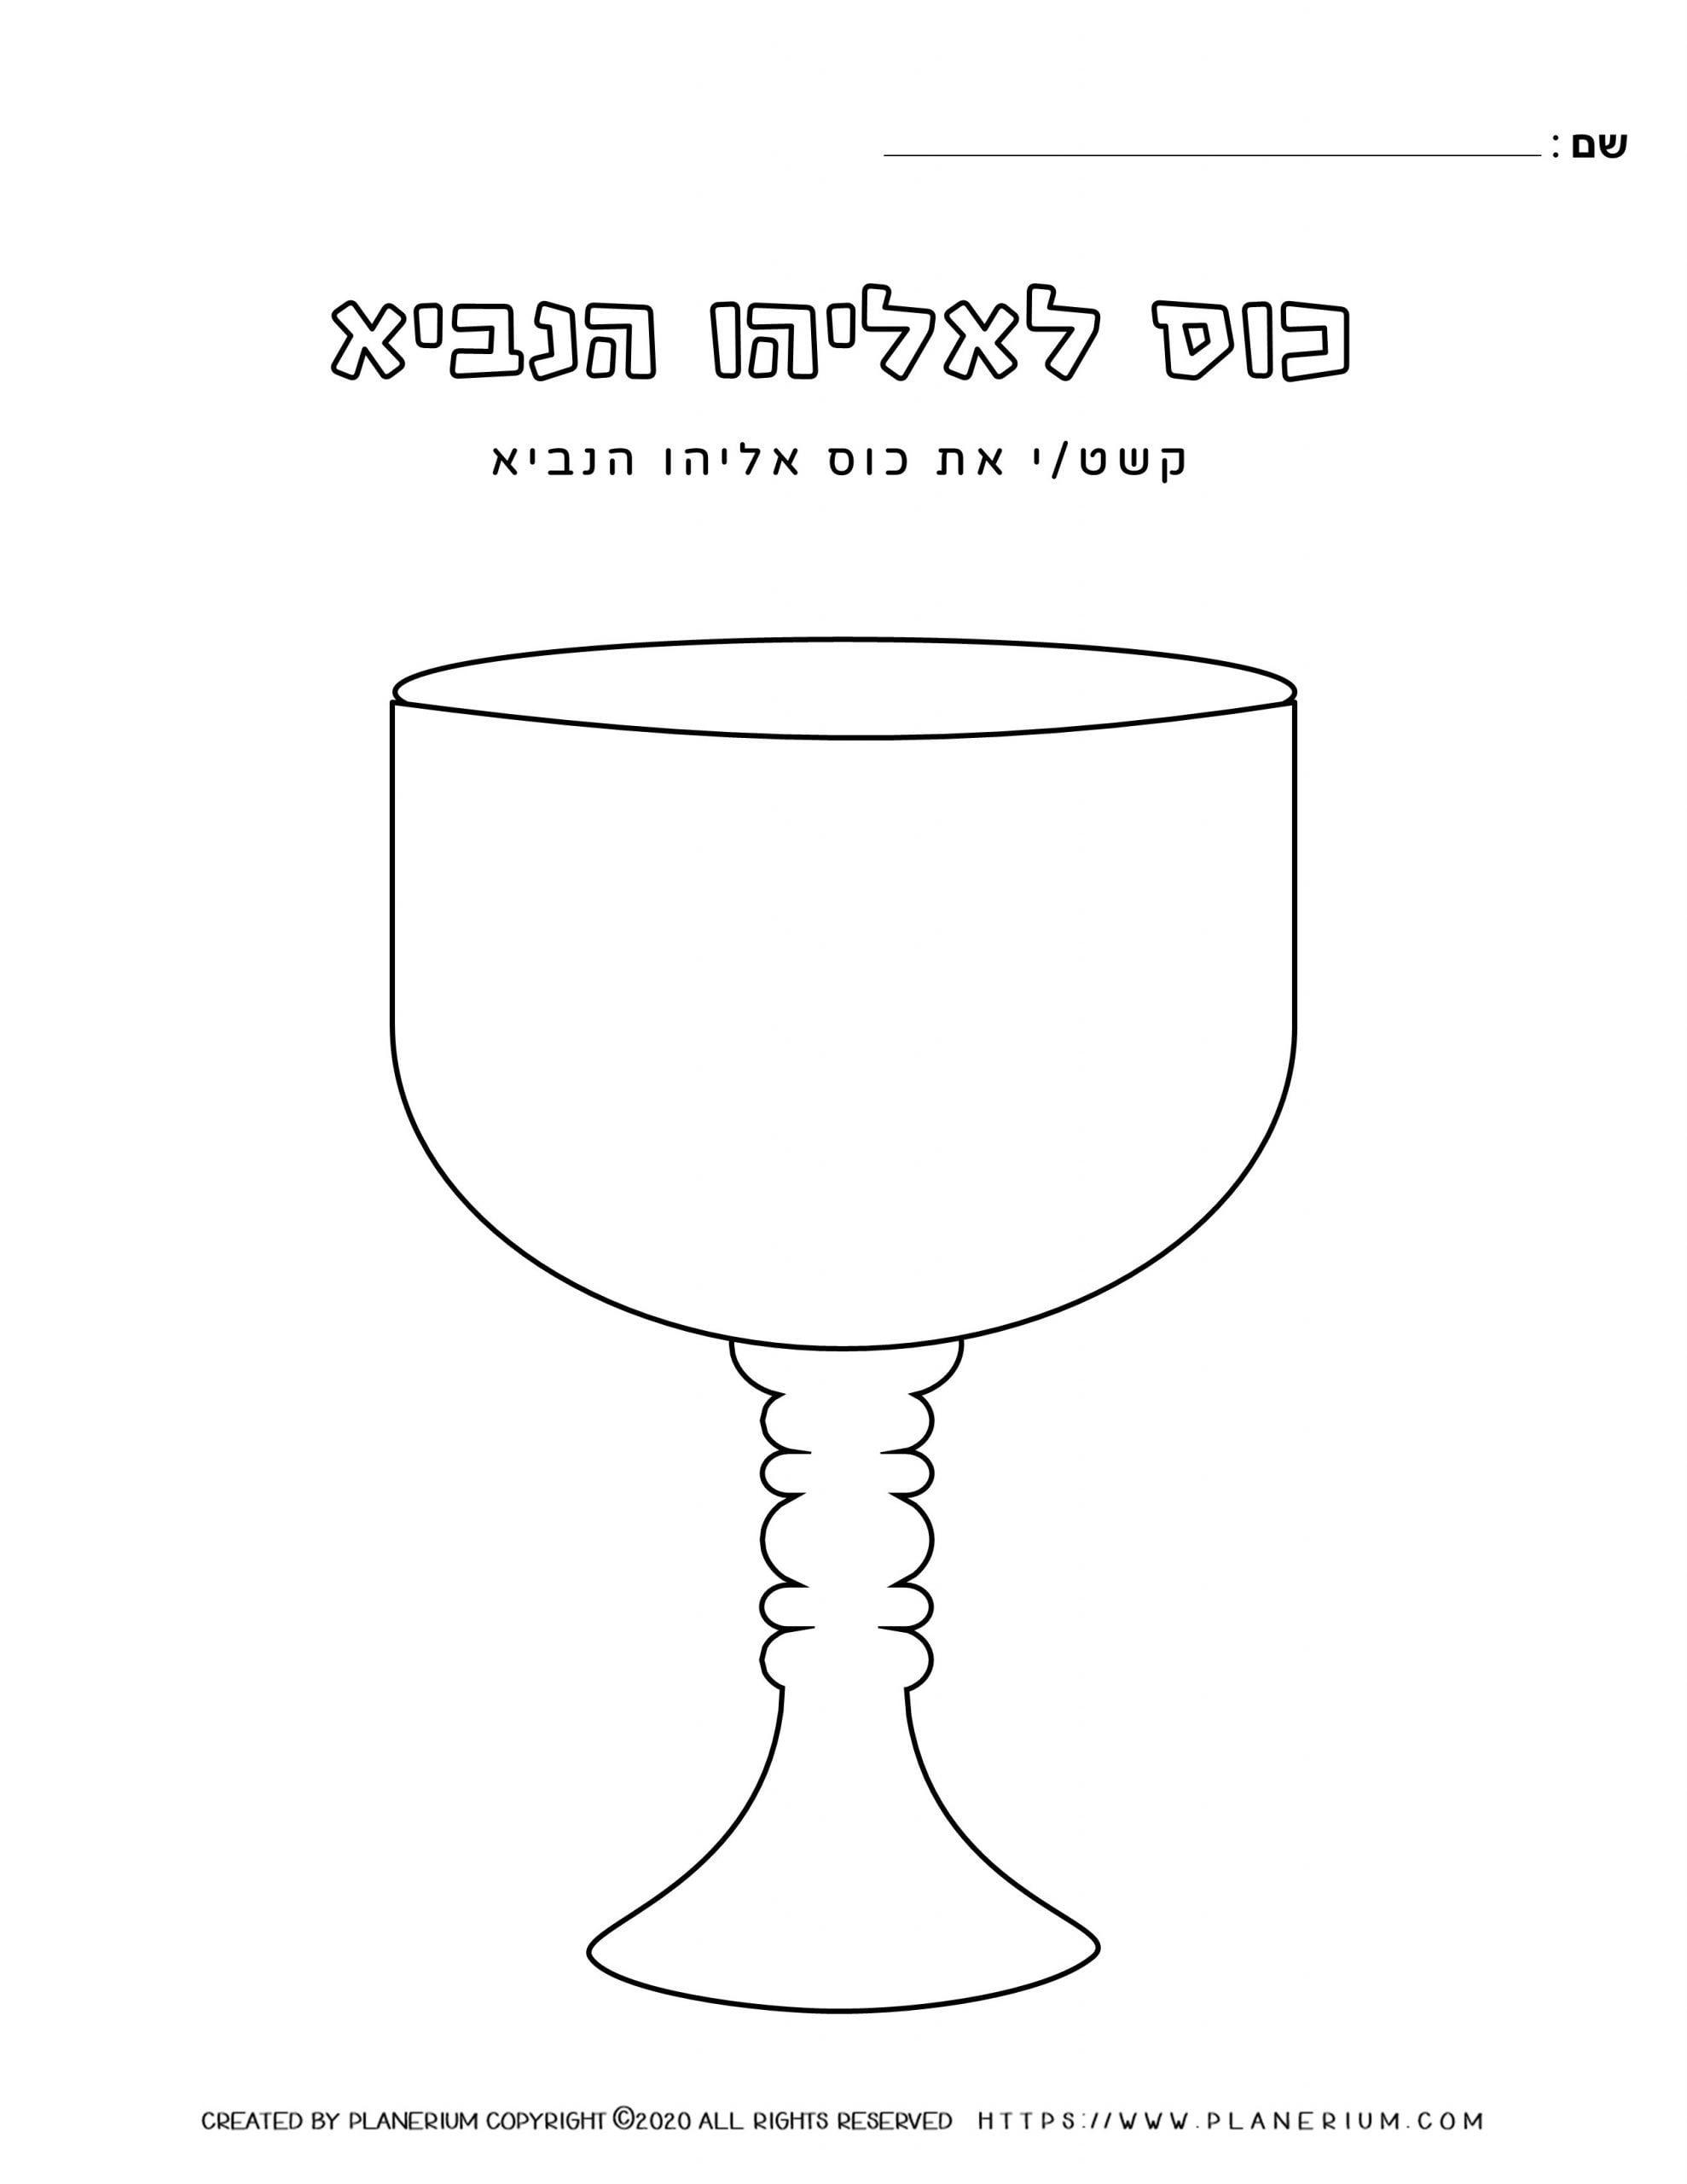 Passover worksheet - Elijah cup template - Hebrew title